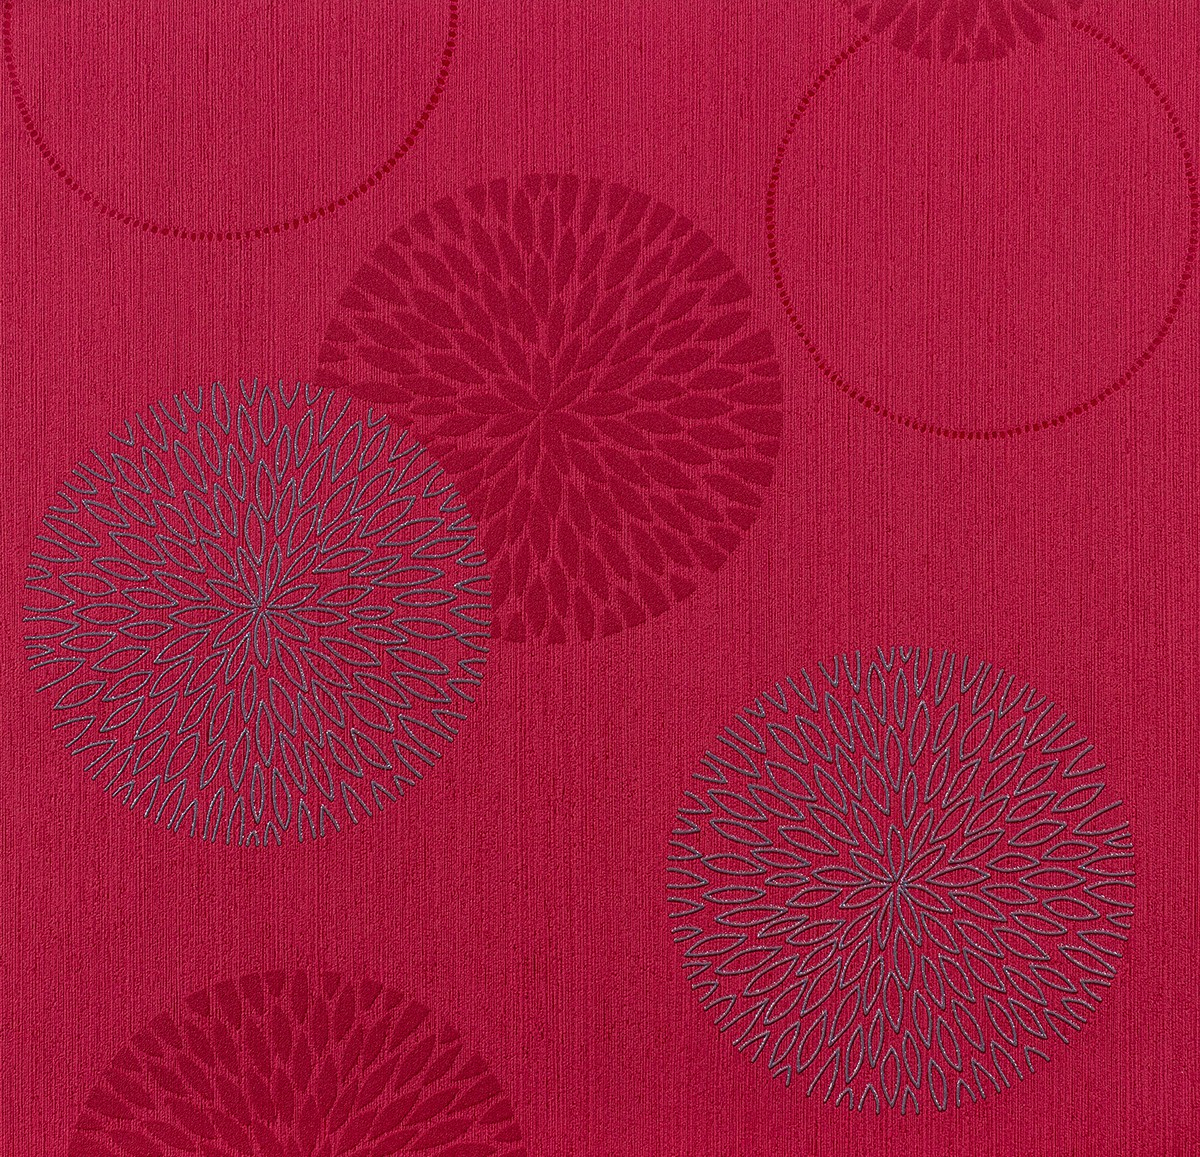 vliestapete grafik rot silber as creation 93792 3. Black Bedroom Furniture Sets. Home Design Ideas